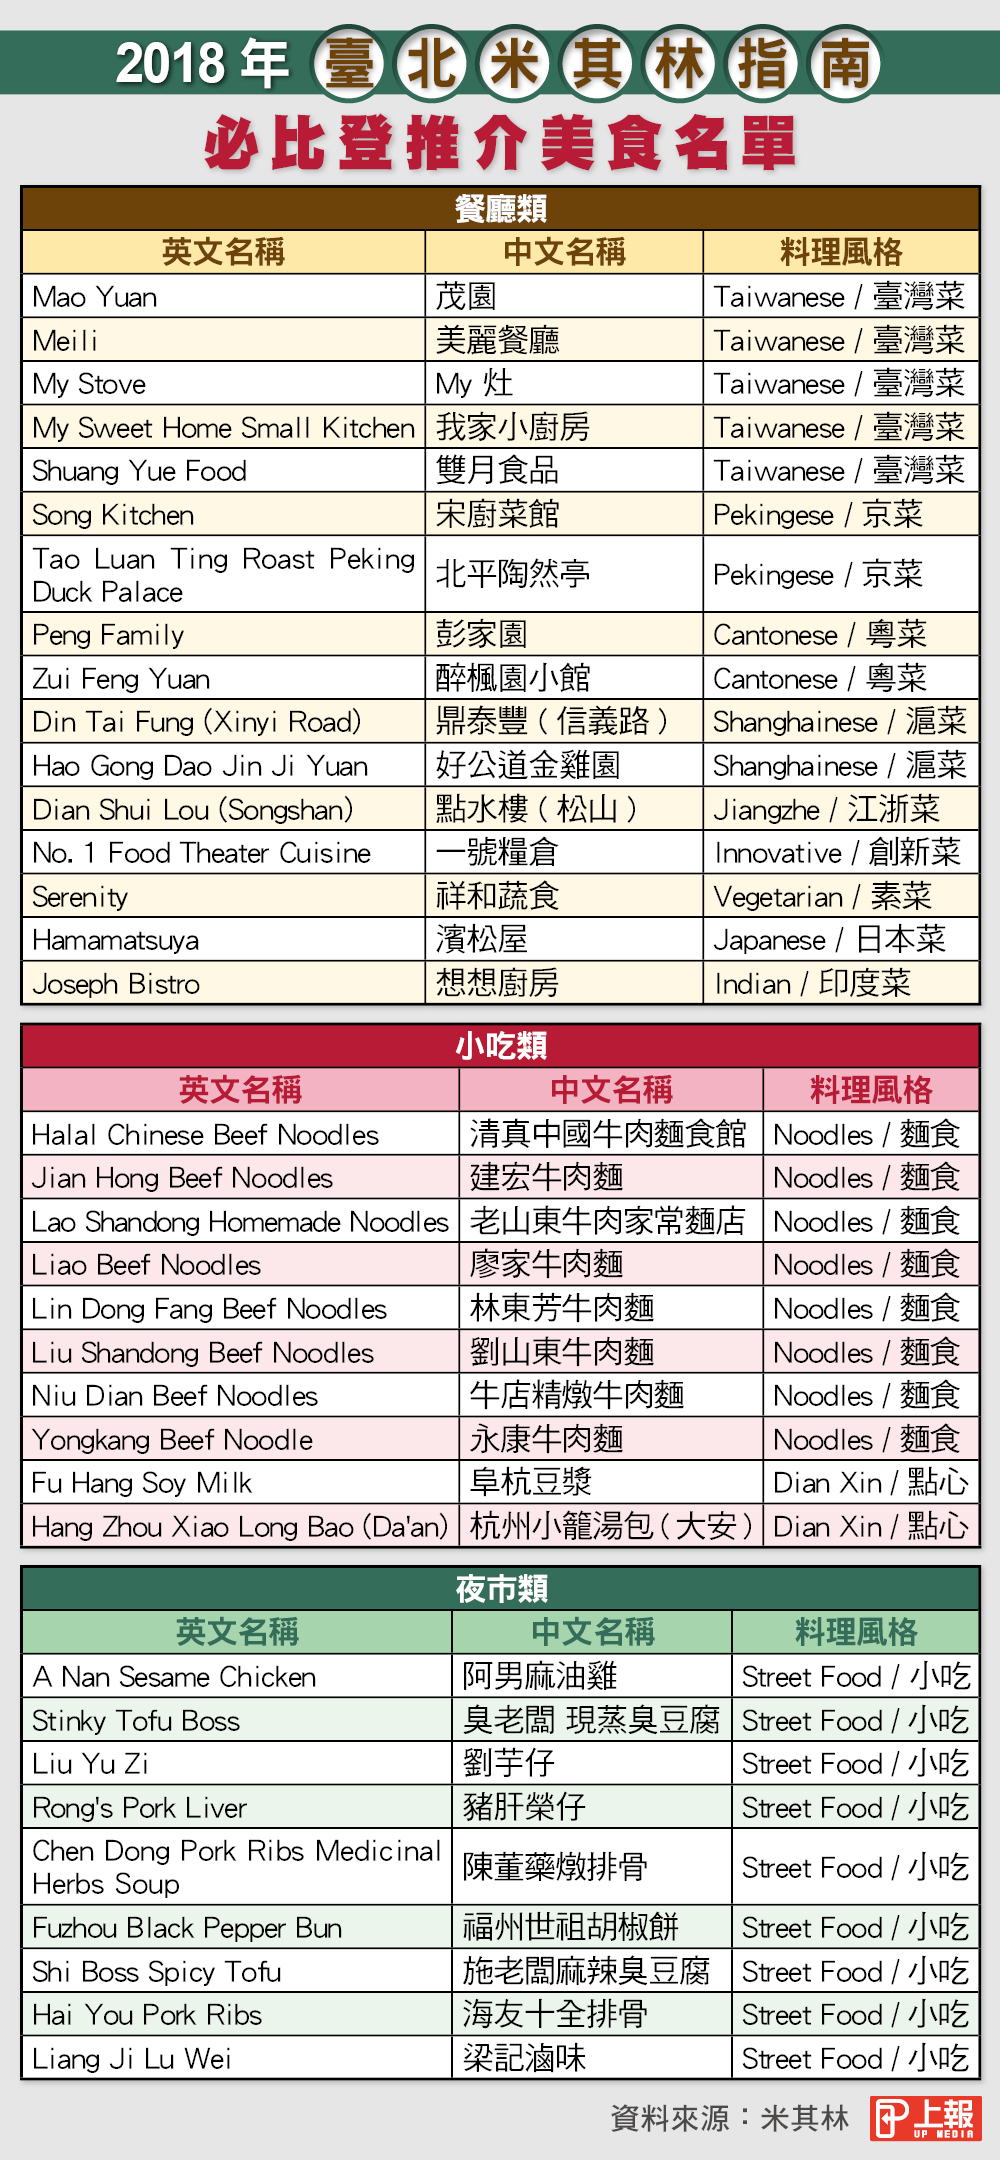 img 5aa096f5579d7 - 2018《臺北米其林指南》美食名單公佈:網友表示「超多遺珠!」